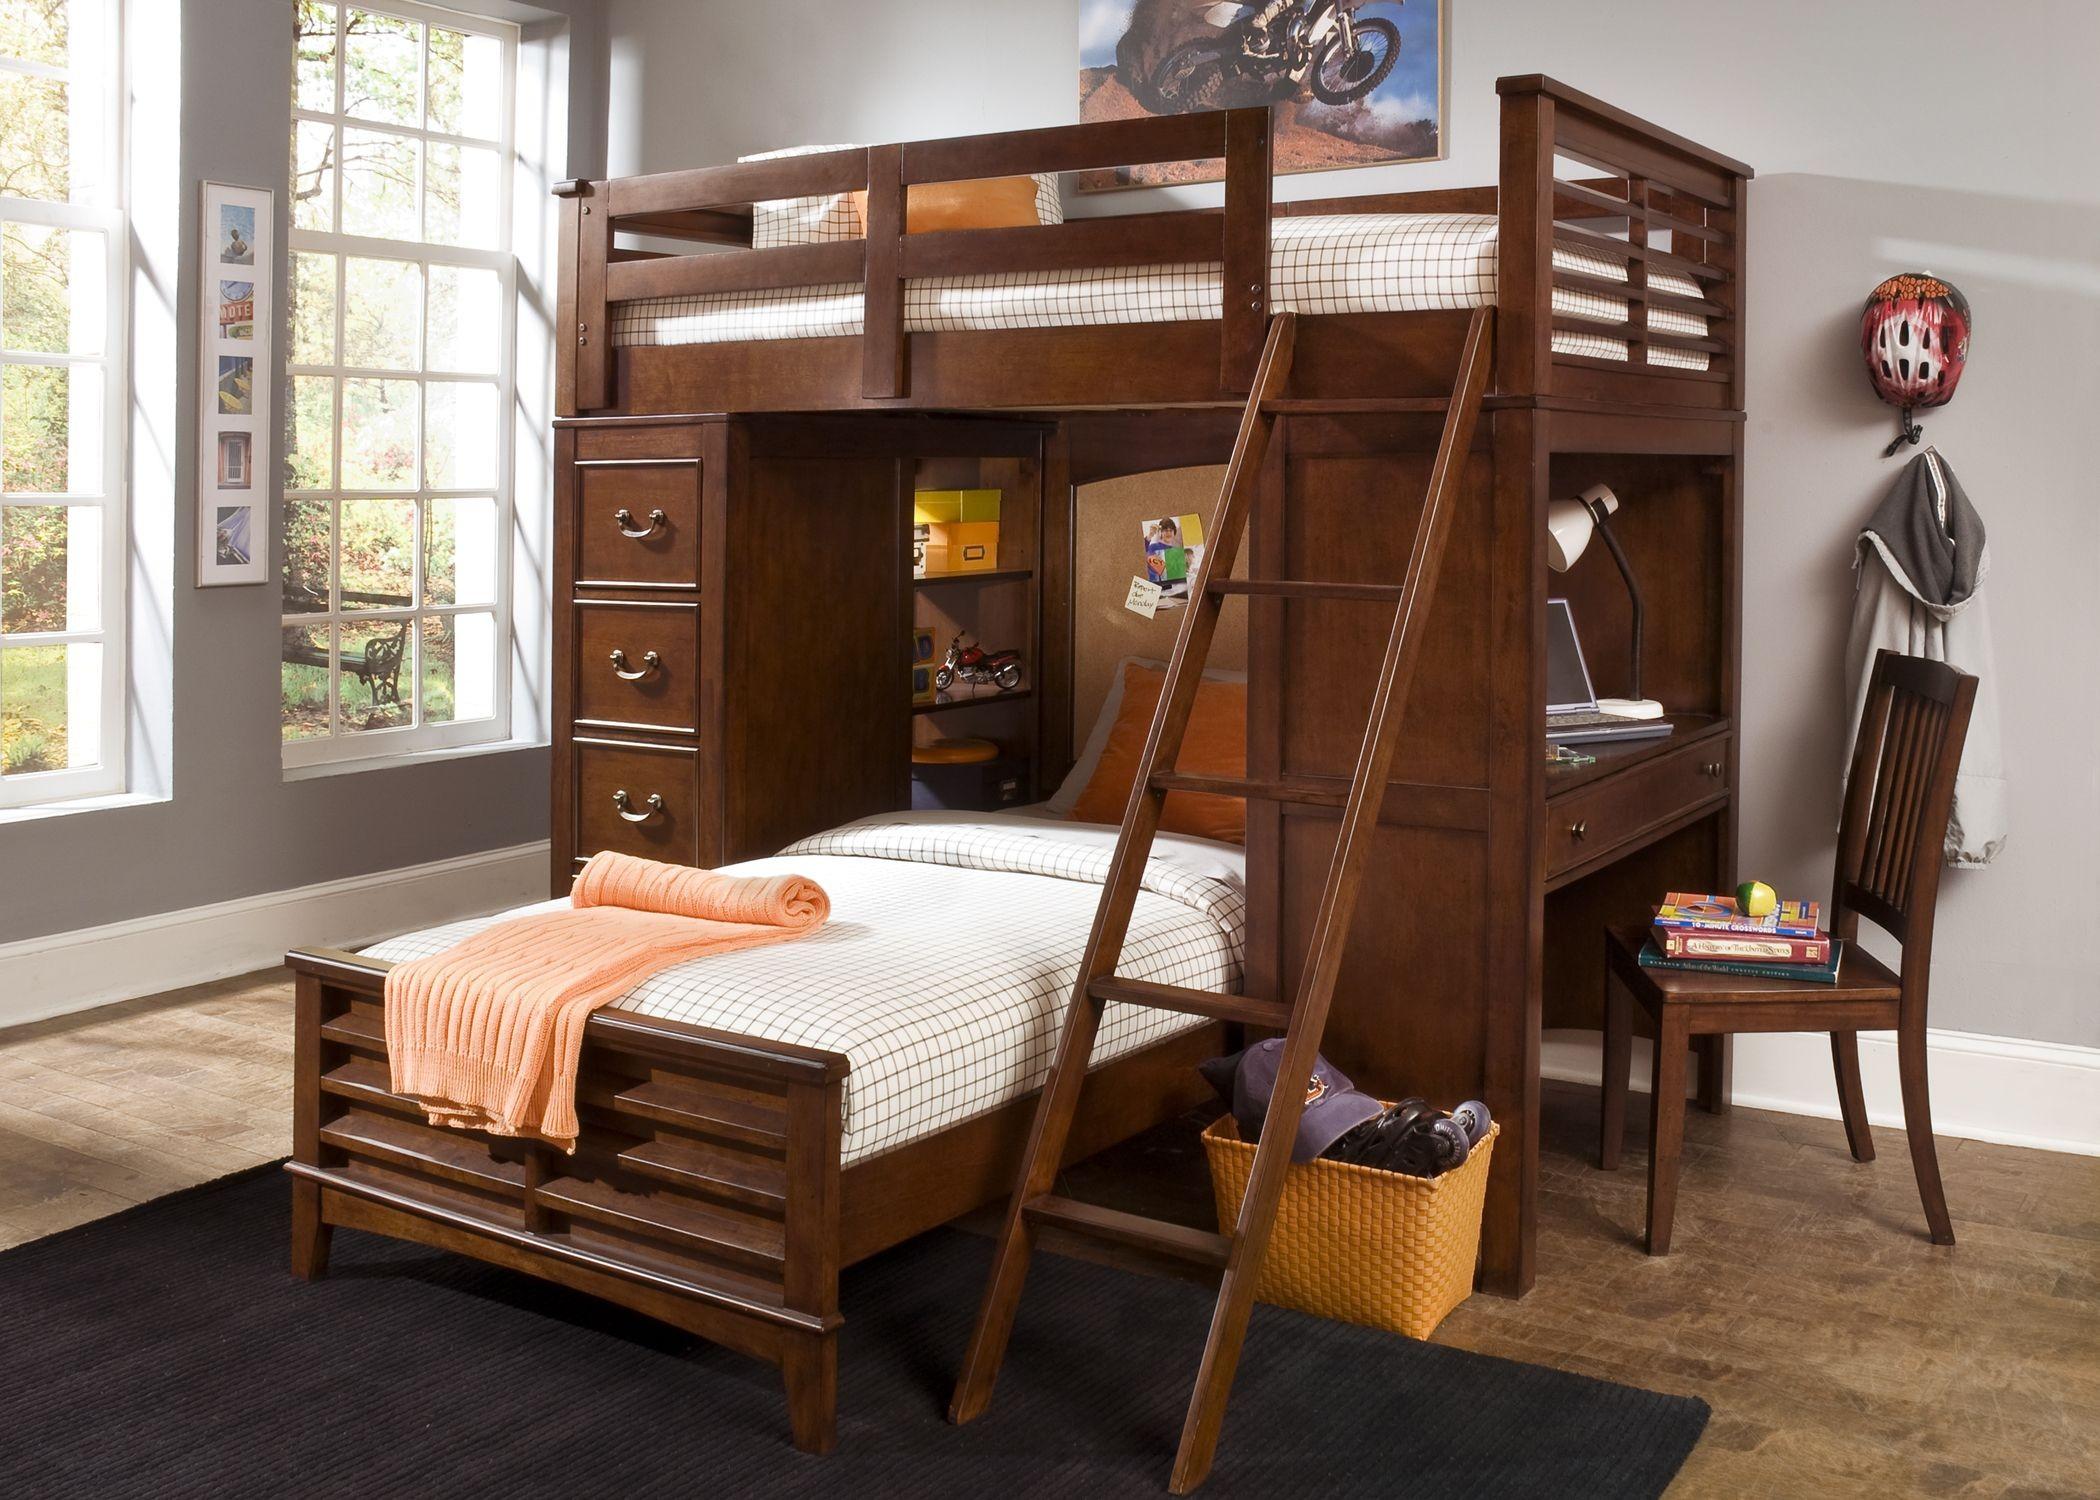 online retailer 4ef65 e82c0 Chelsea Square Youth Loft Bed with Cork Bedroom Set